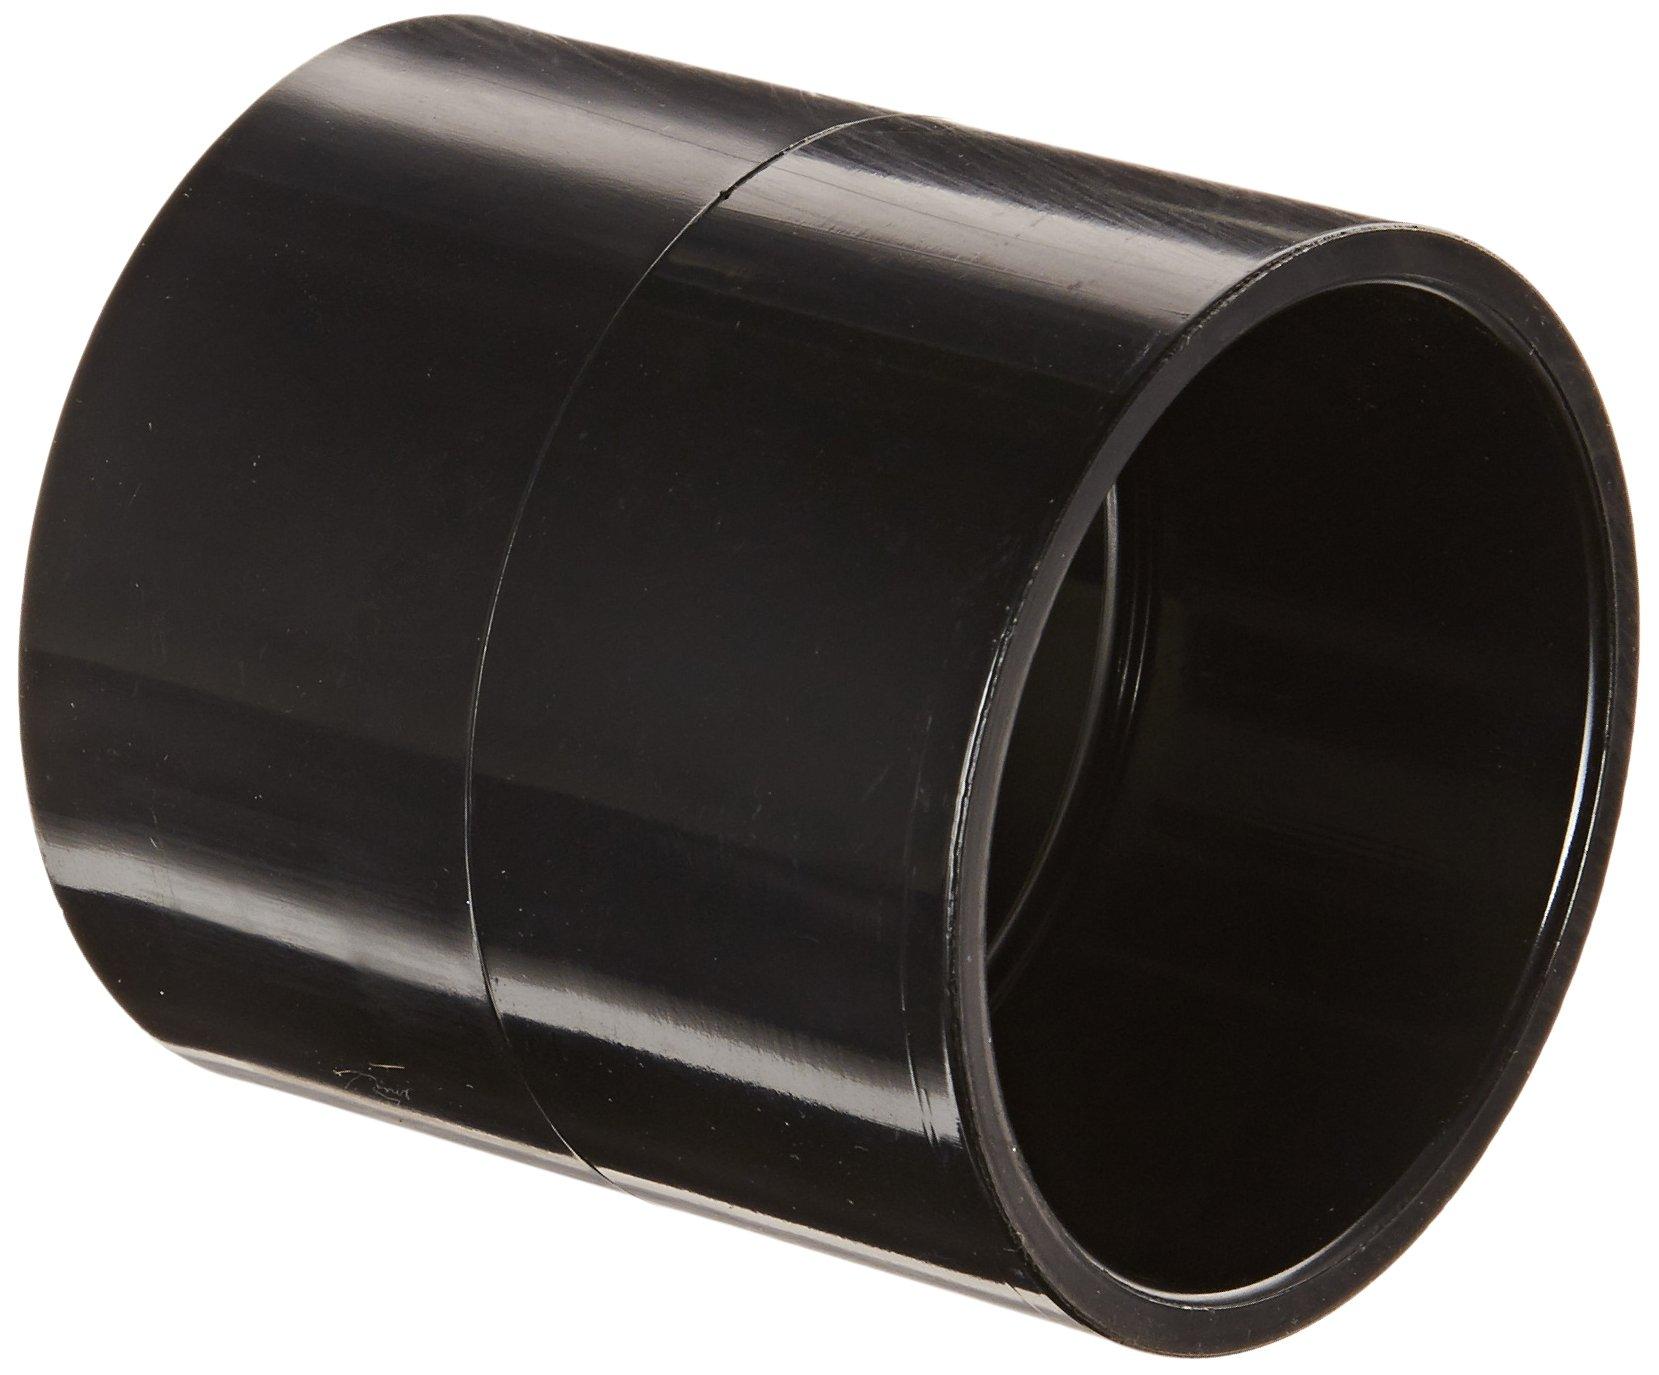 "Spears 429-B Series PVC Pipe Fitting, Coupling, Schedule 40, Black, 2"" Socket"